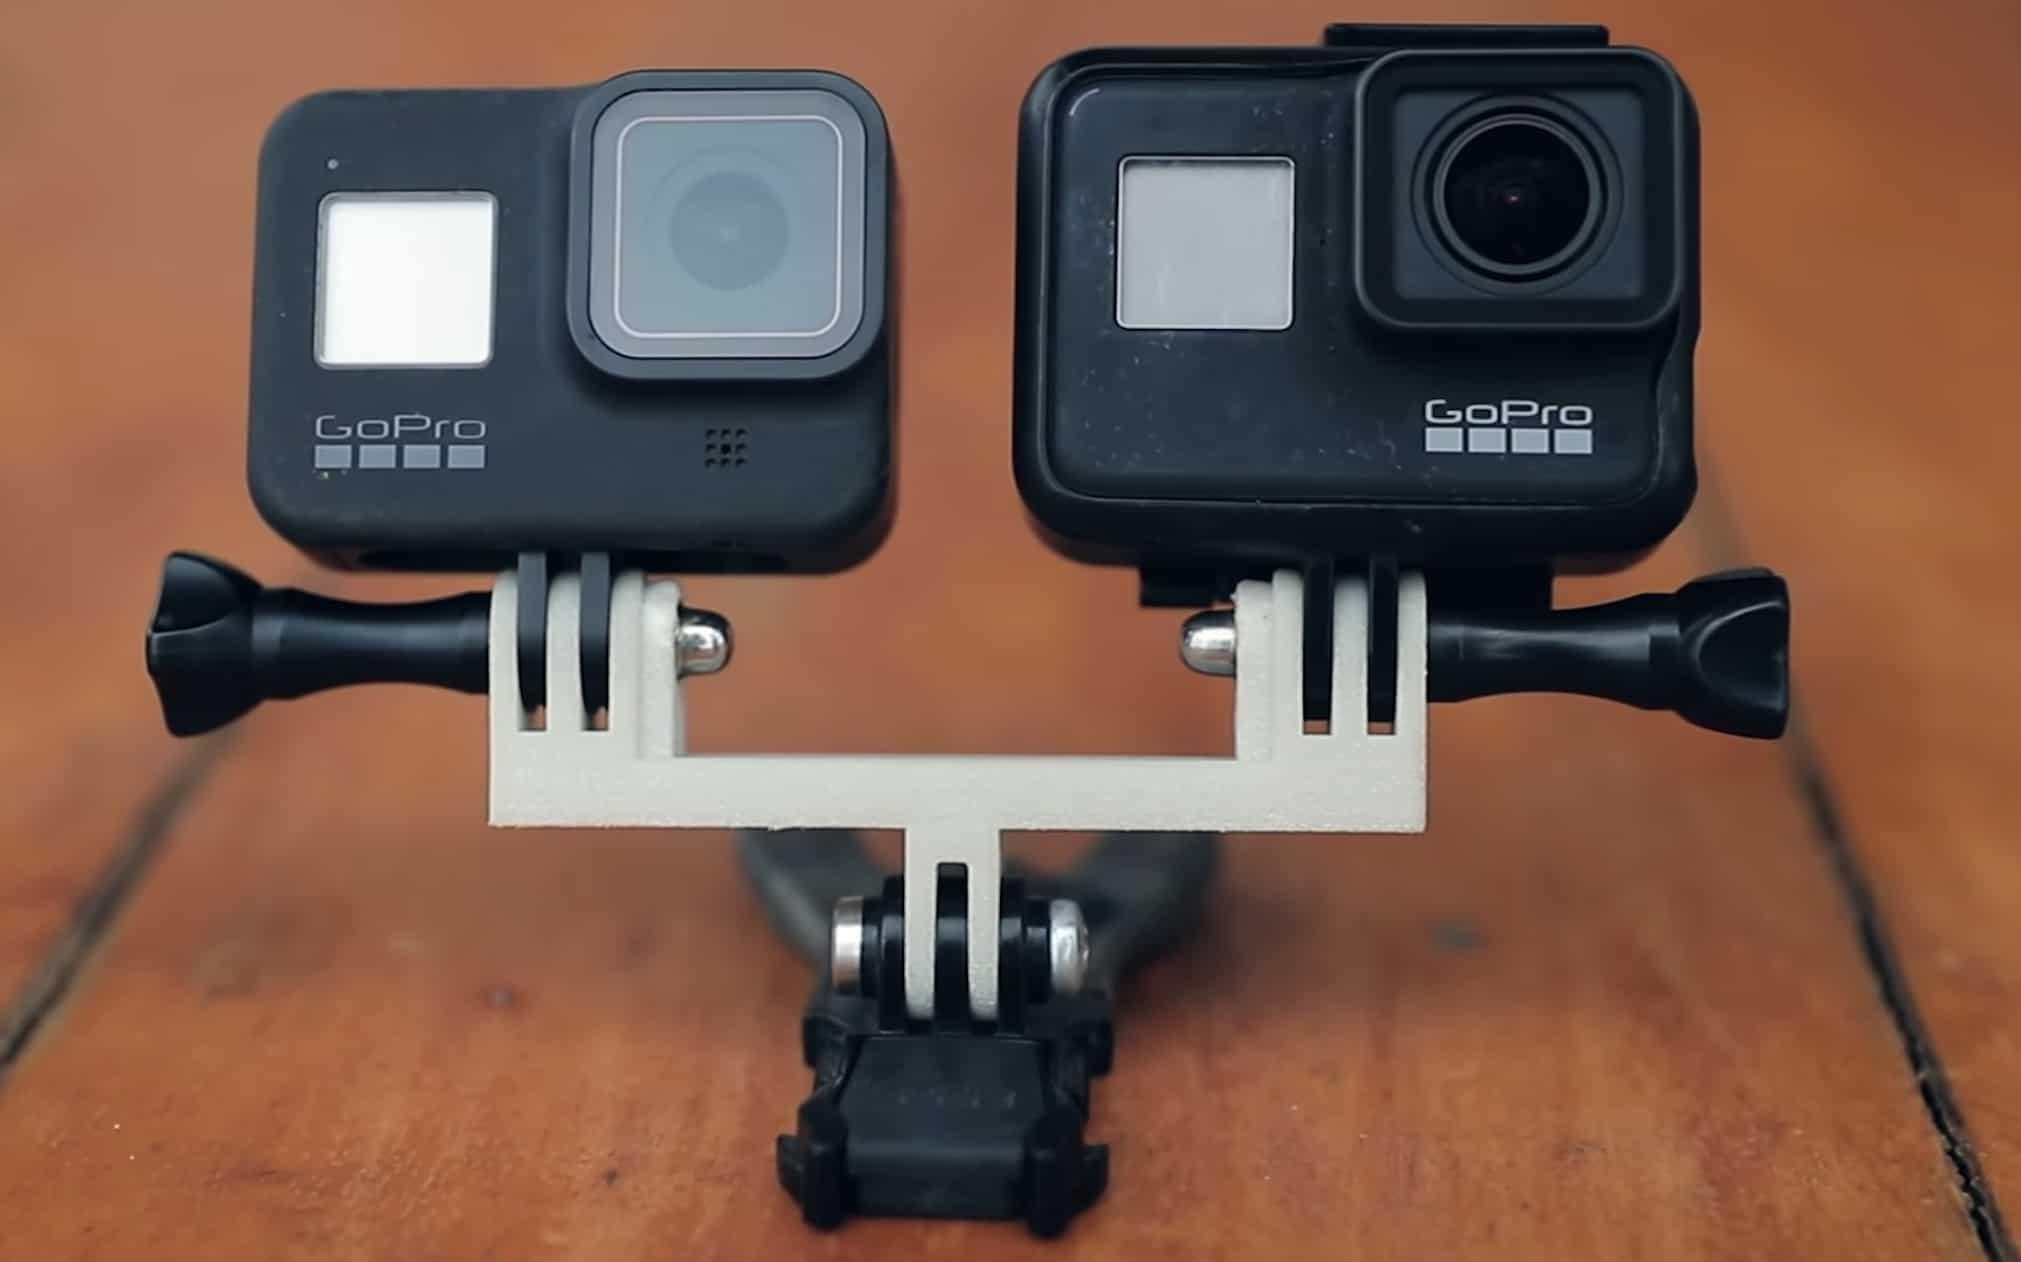 Review GoPro Hero 8 Black (Action Camera) - Sepeda.Me